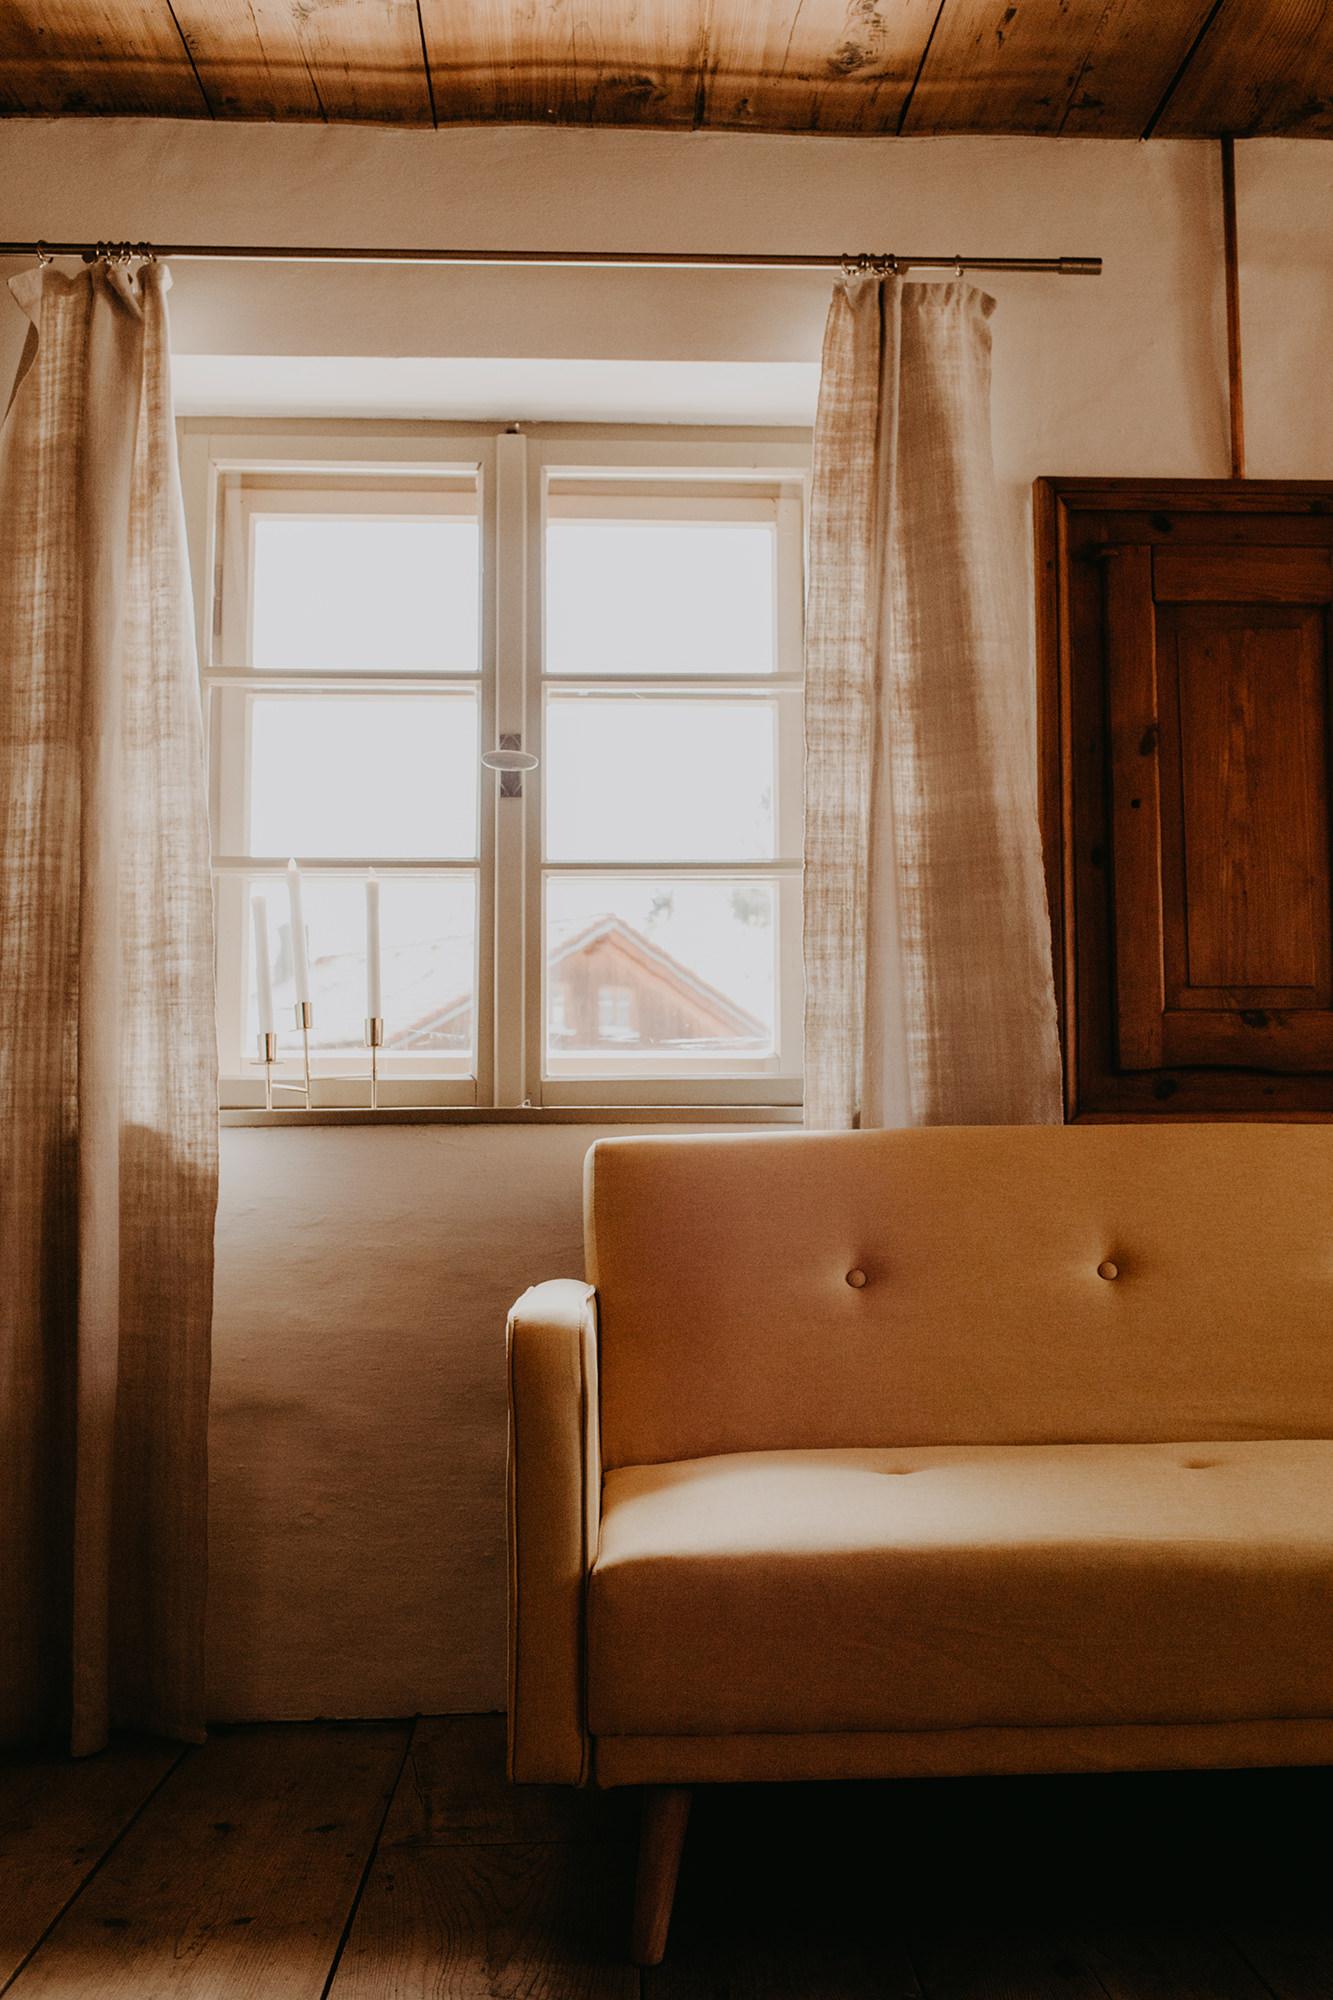 Interiorfotografie-Fotograf-Hamburg-Fotoshooting-Anna-Fichtner-j2